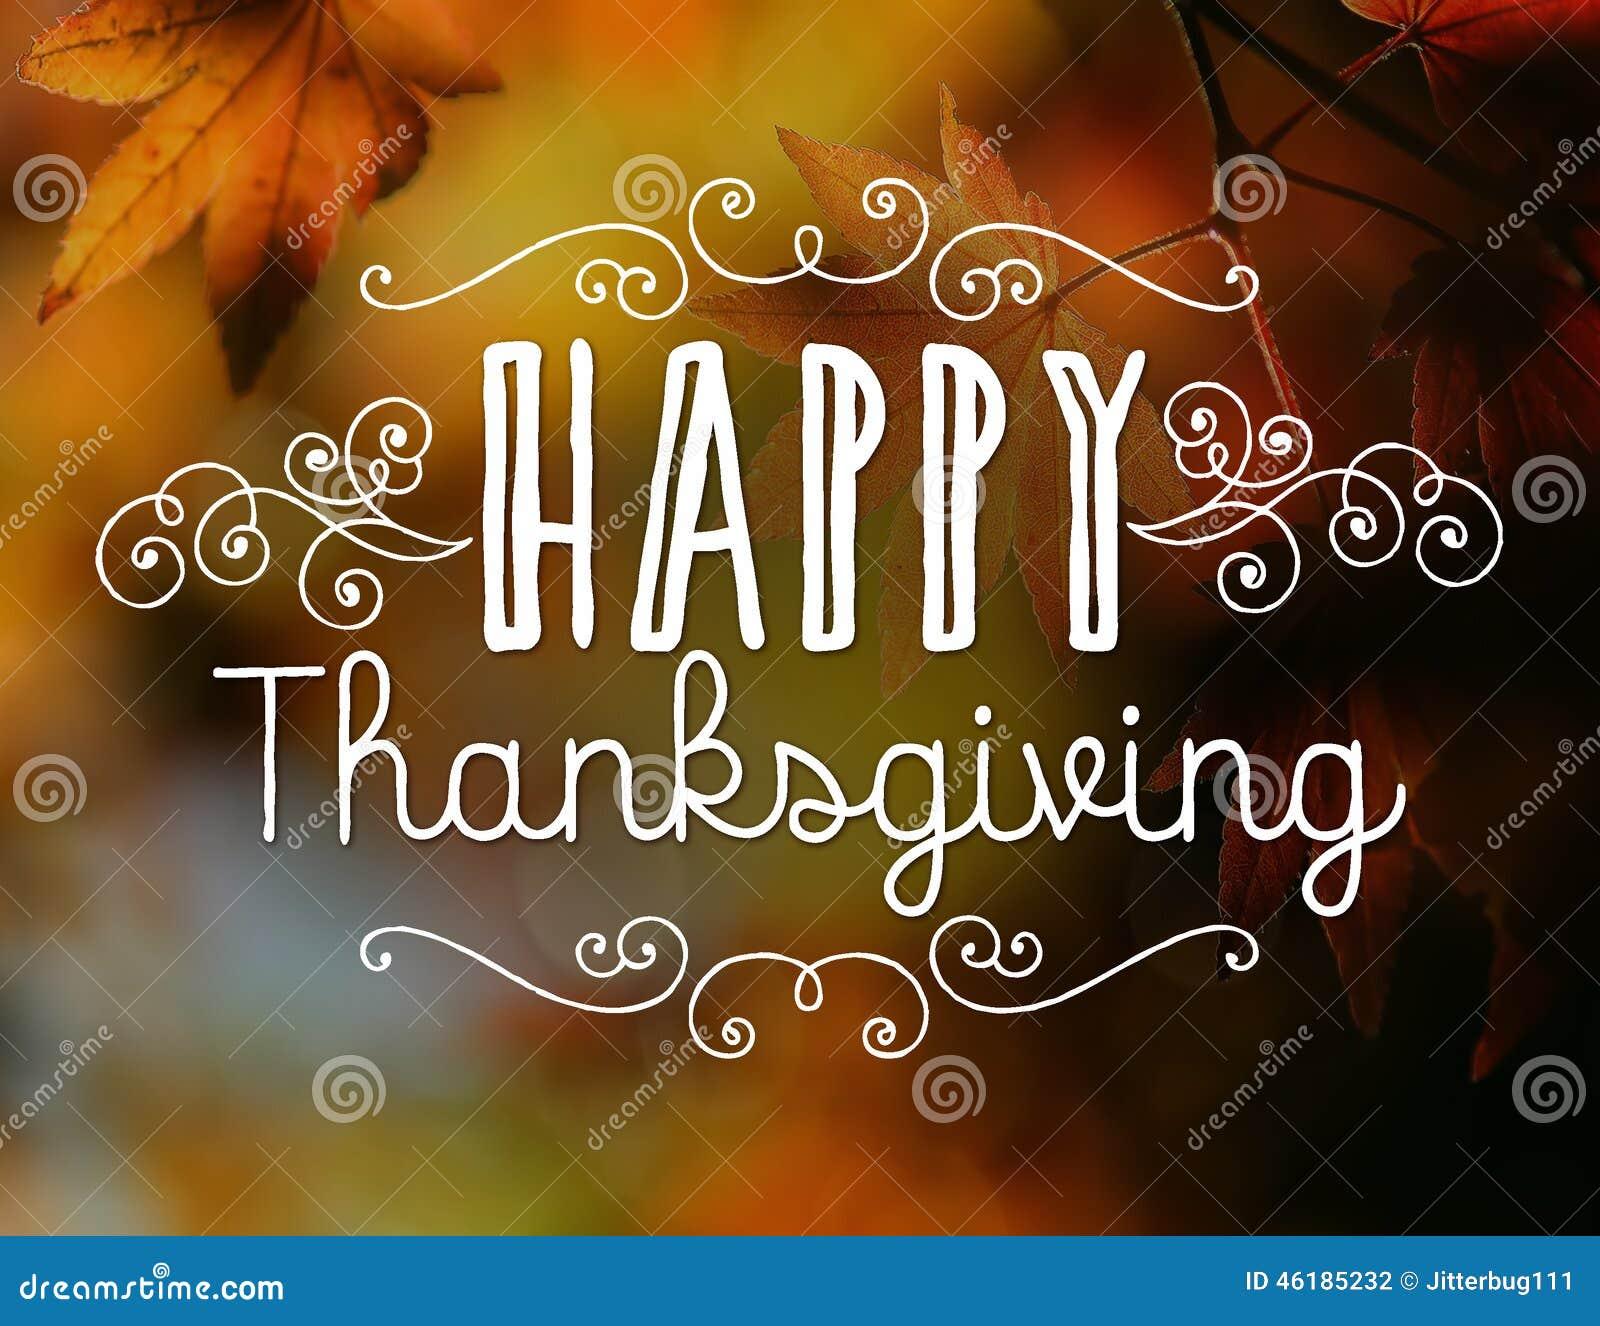 Happy Thanksgiving >> Happy Thanksgiving Stock Illustration Illustration Of Type 46185232